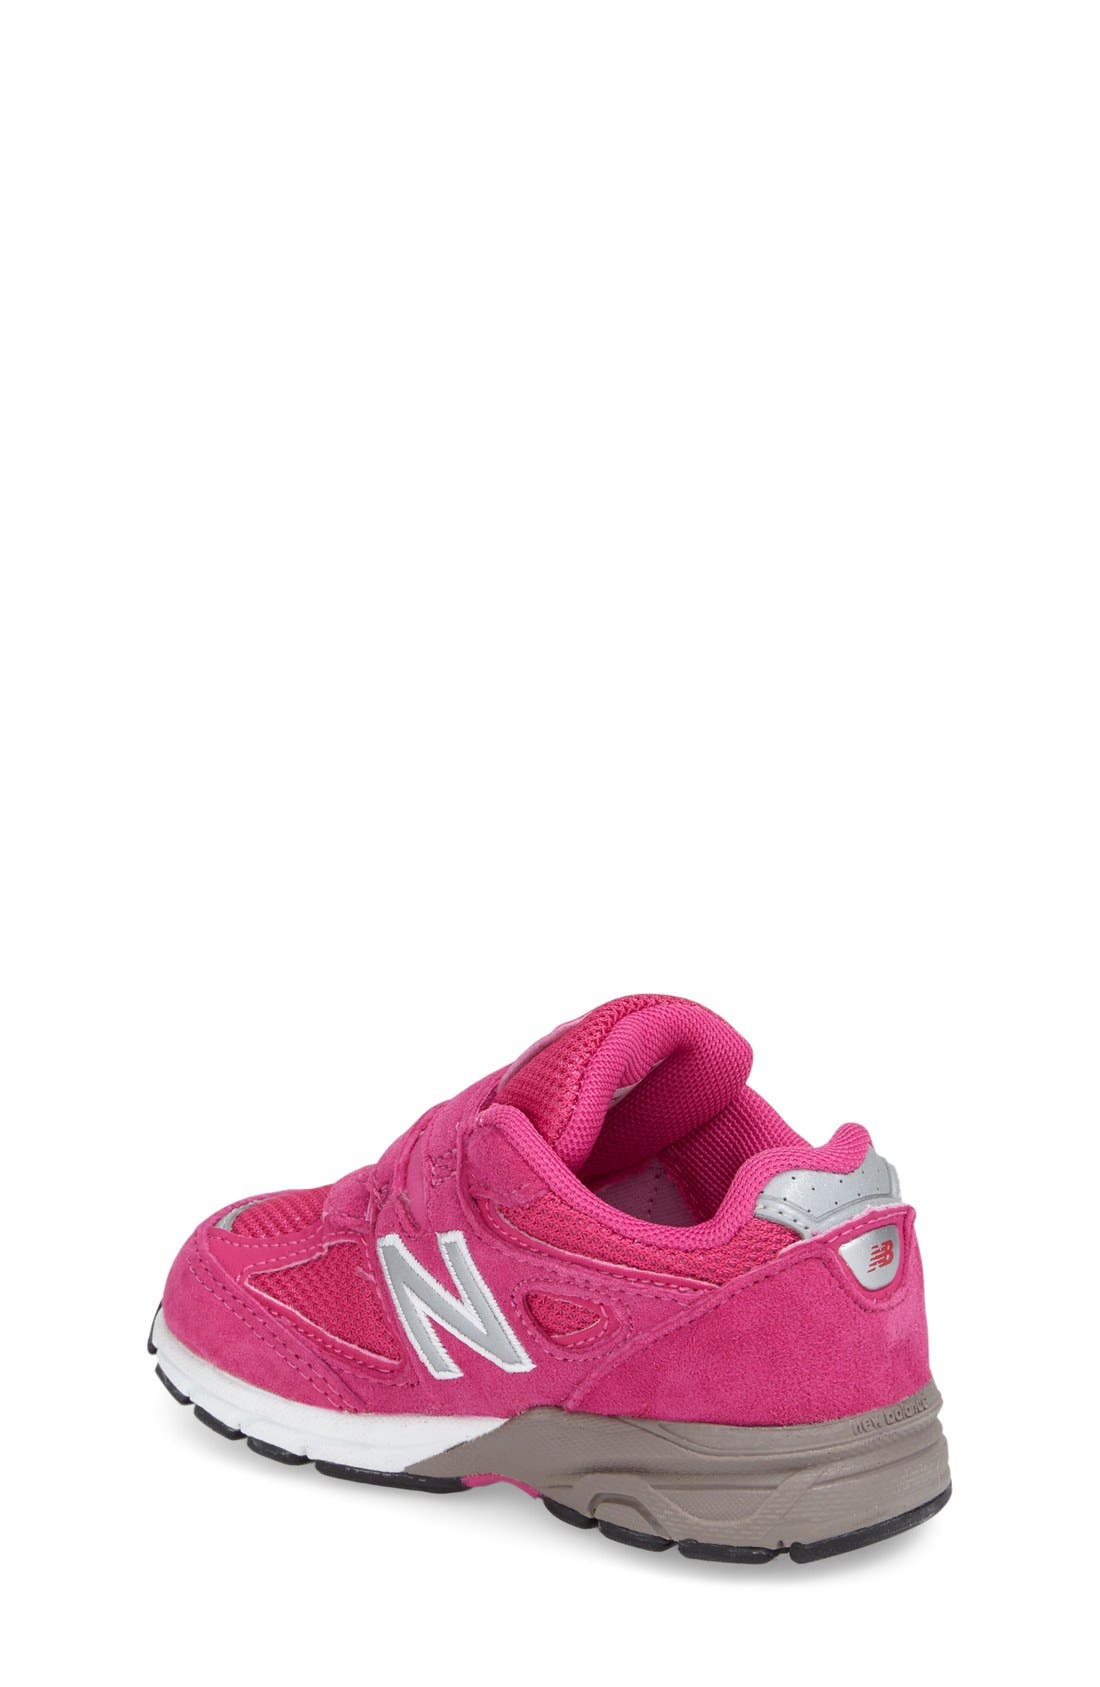 '990' Sneaker,                             Alternate thumbnail 2, color,                             Pink